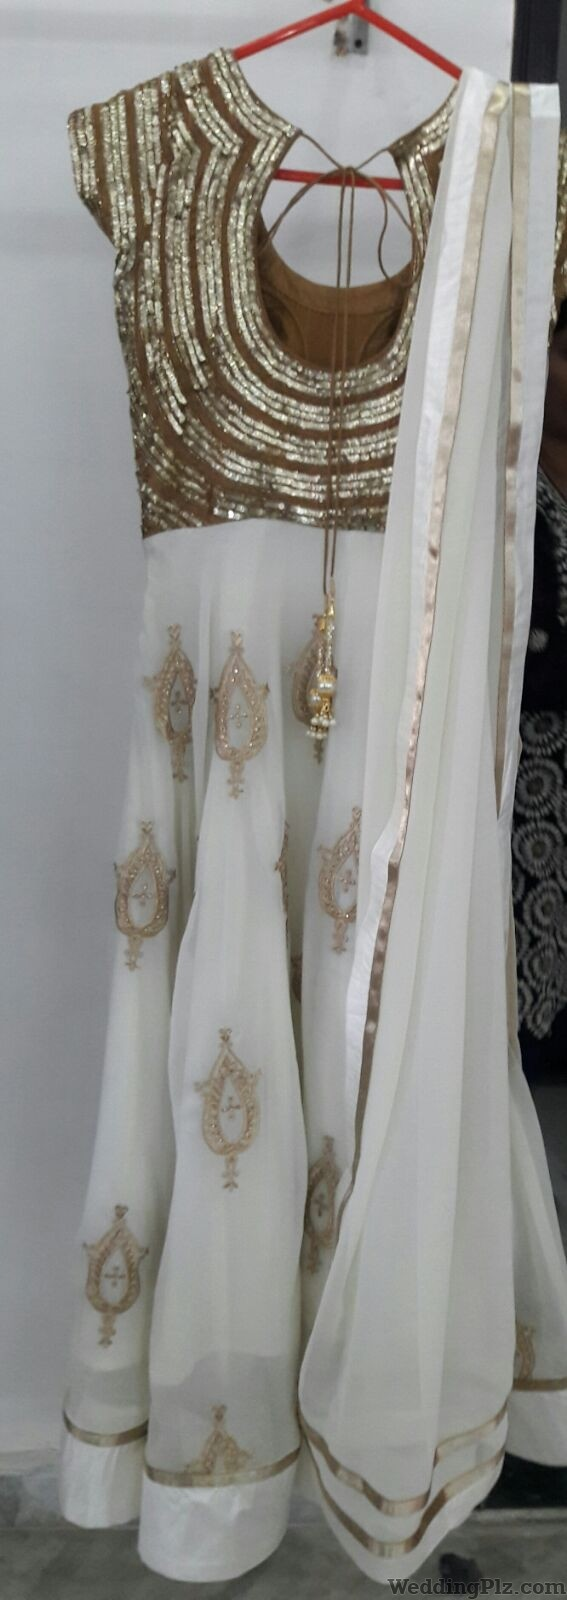 Darzi On Call Wedding Lehnga and Sarees weddingplz